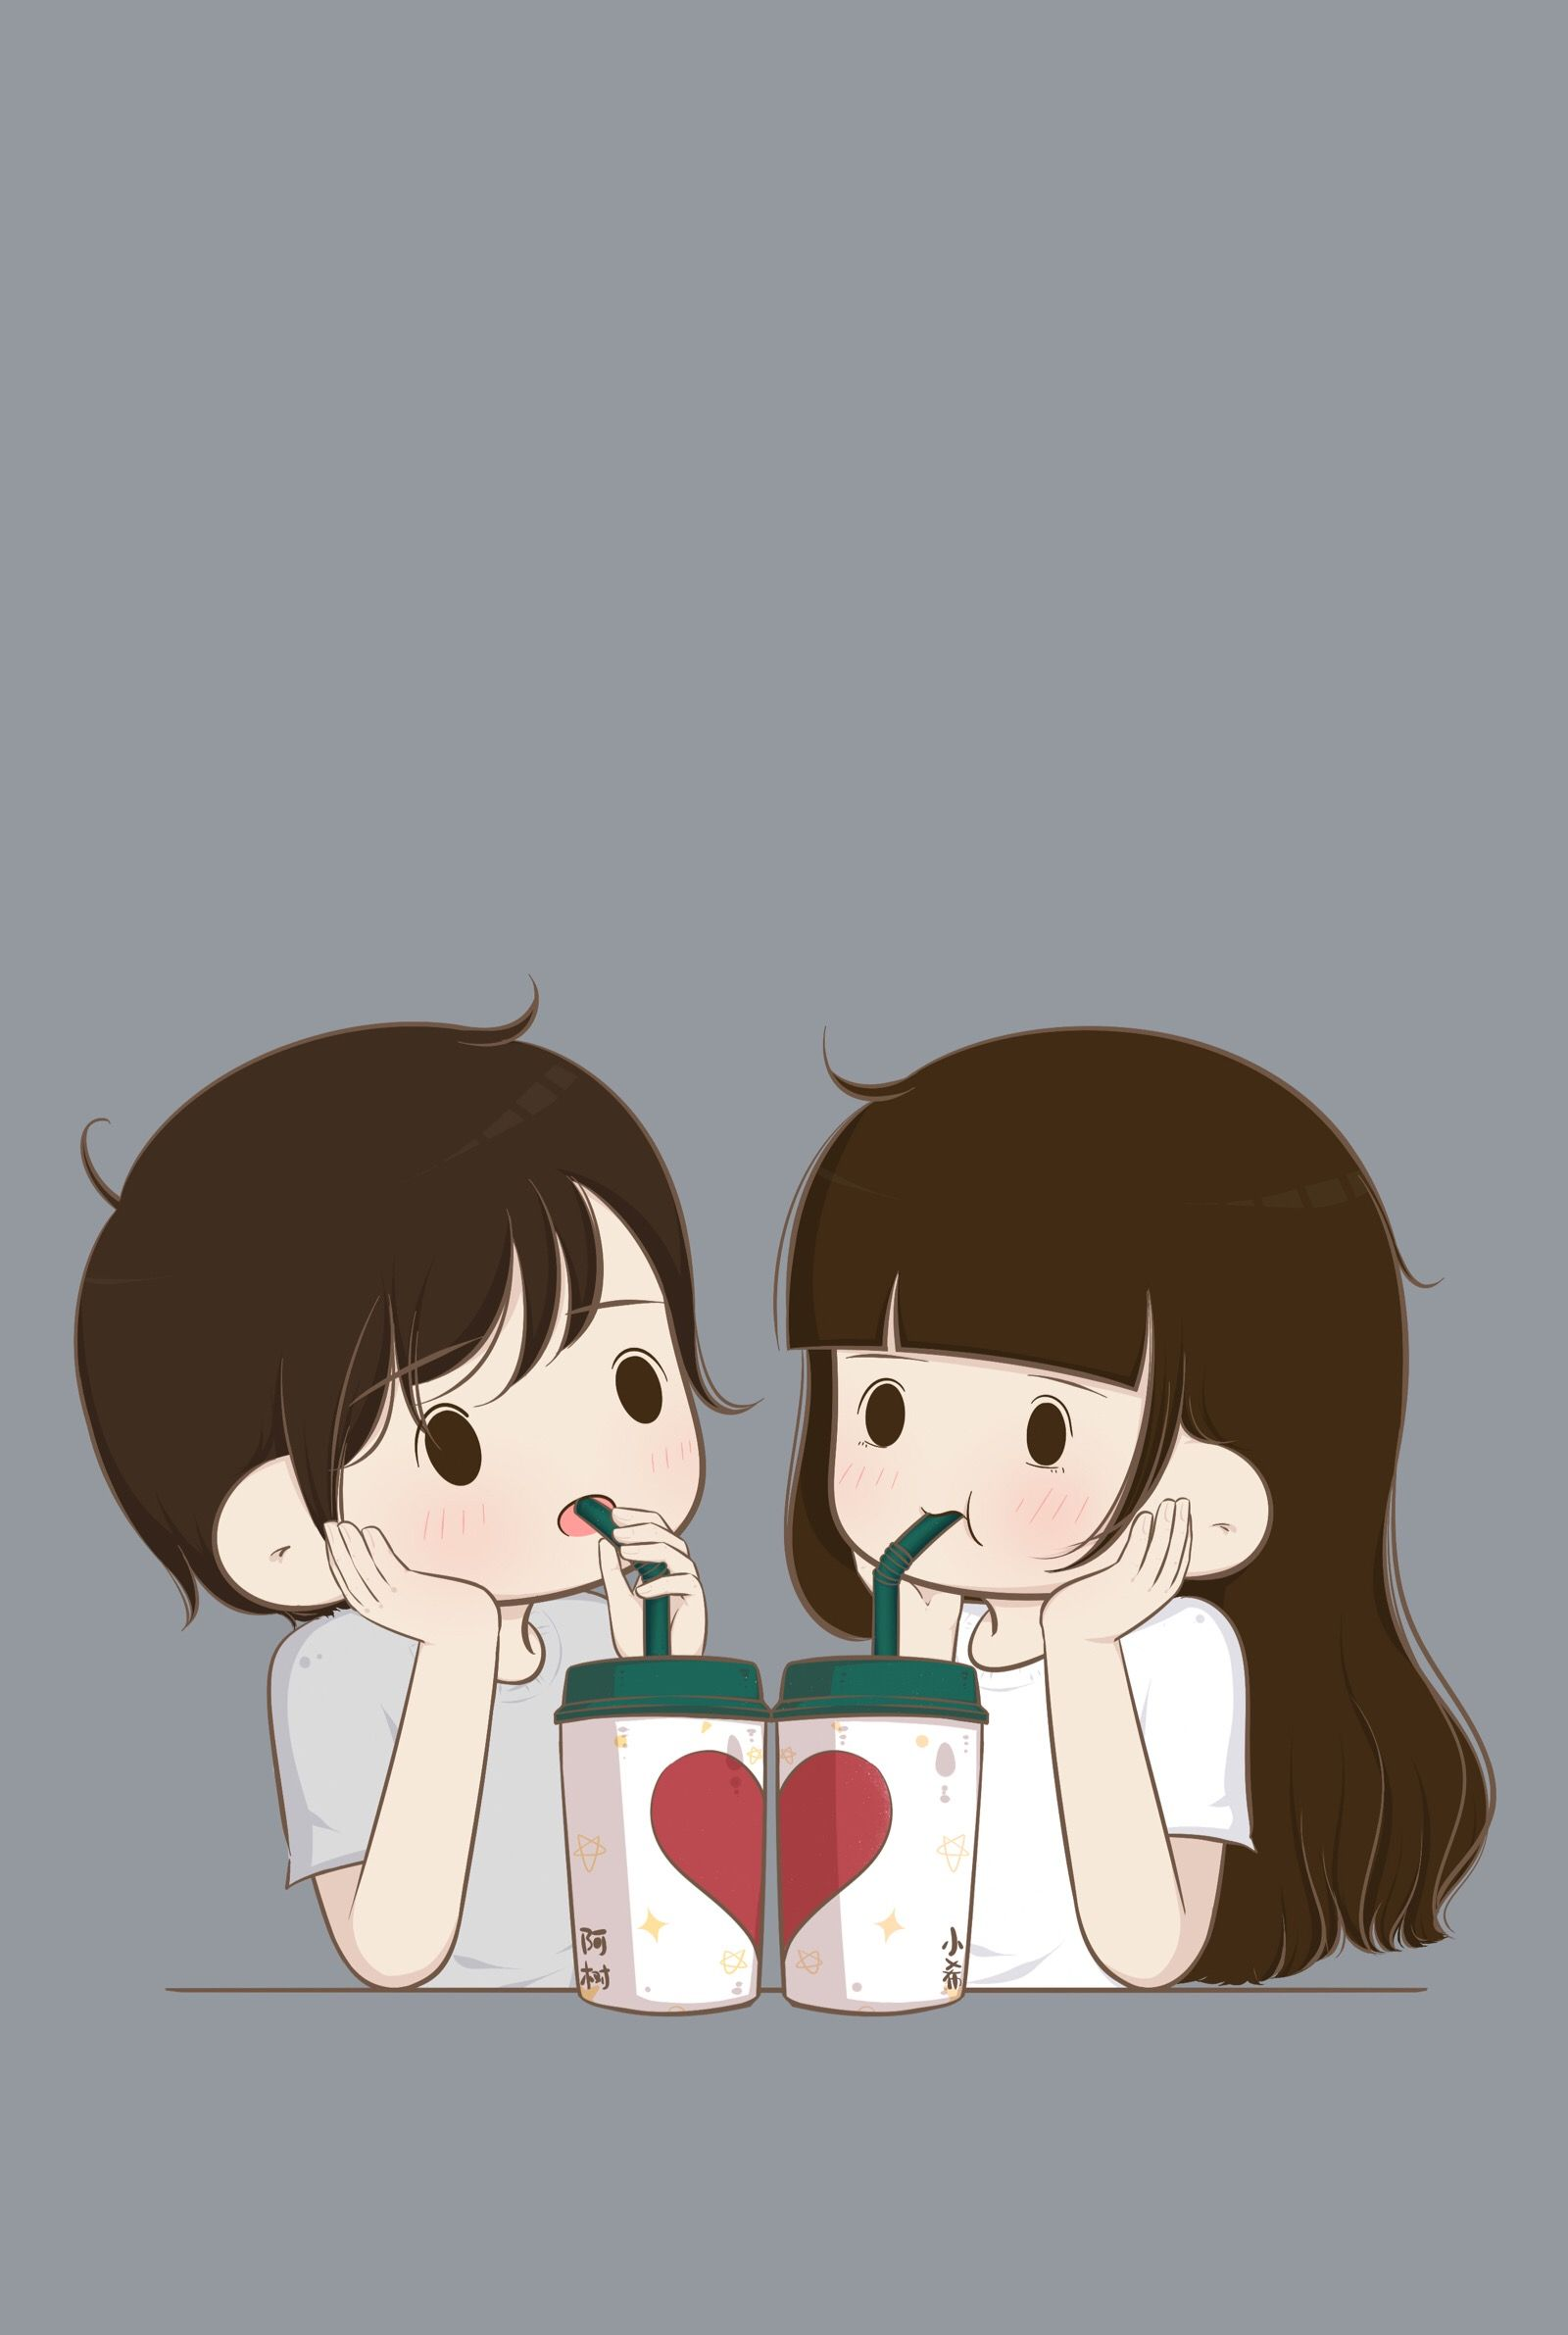 Best Wallpaper Iphone Cute Couple Love 34 Ideas Cute Cartoon Wallpapers Cute Couple Wallpaper Cartoon Wallpaper